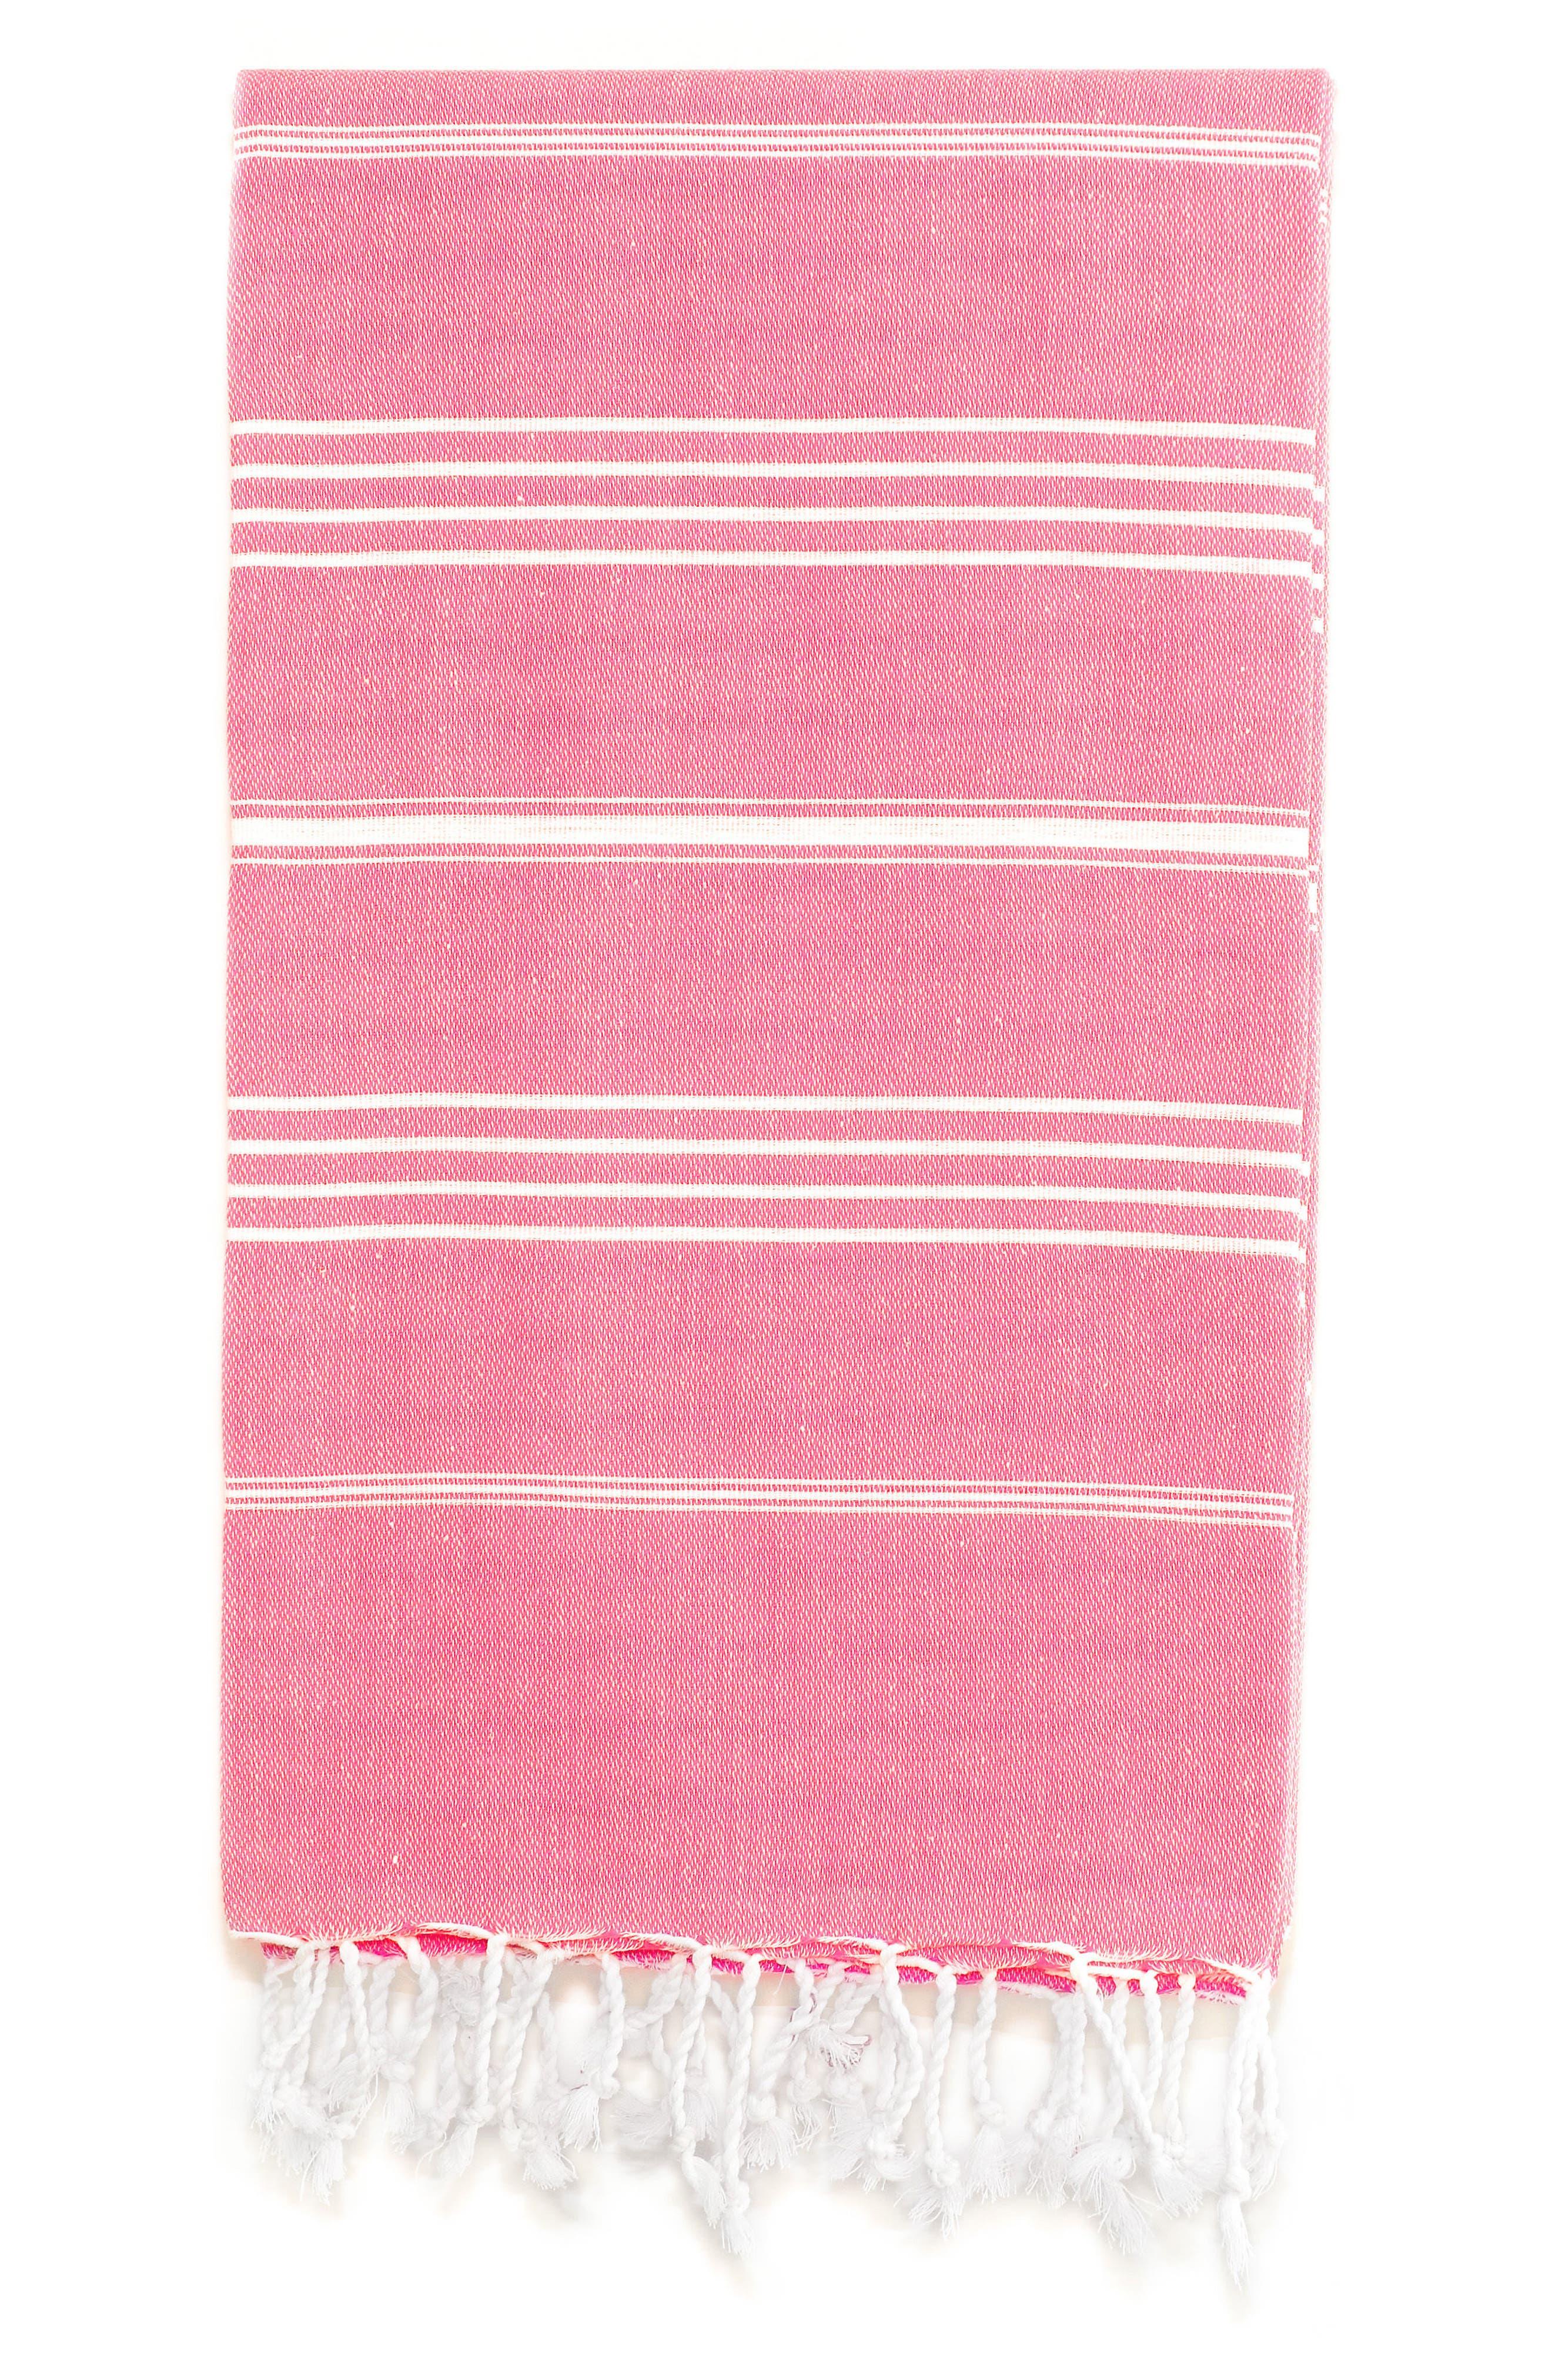 Alternate Image 1 Selected - Linum Home Textiles 'Lucky' Turkish Pestemal Towel